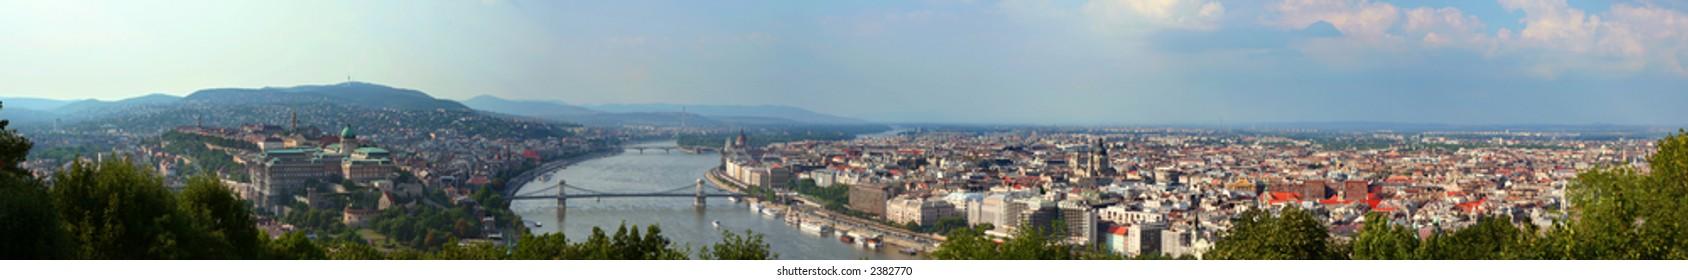 Hi-resolution Budapest Panorama (Hungary)